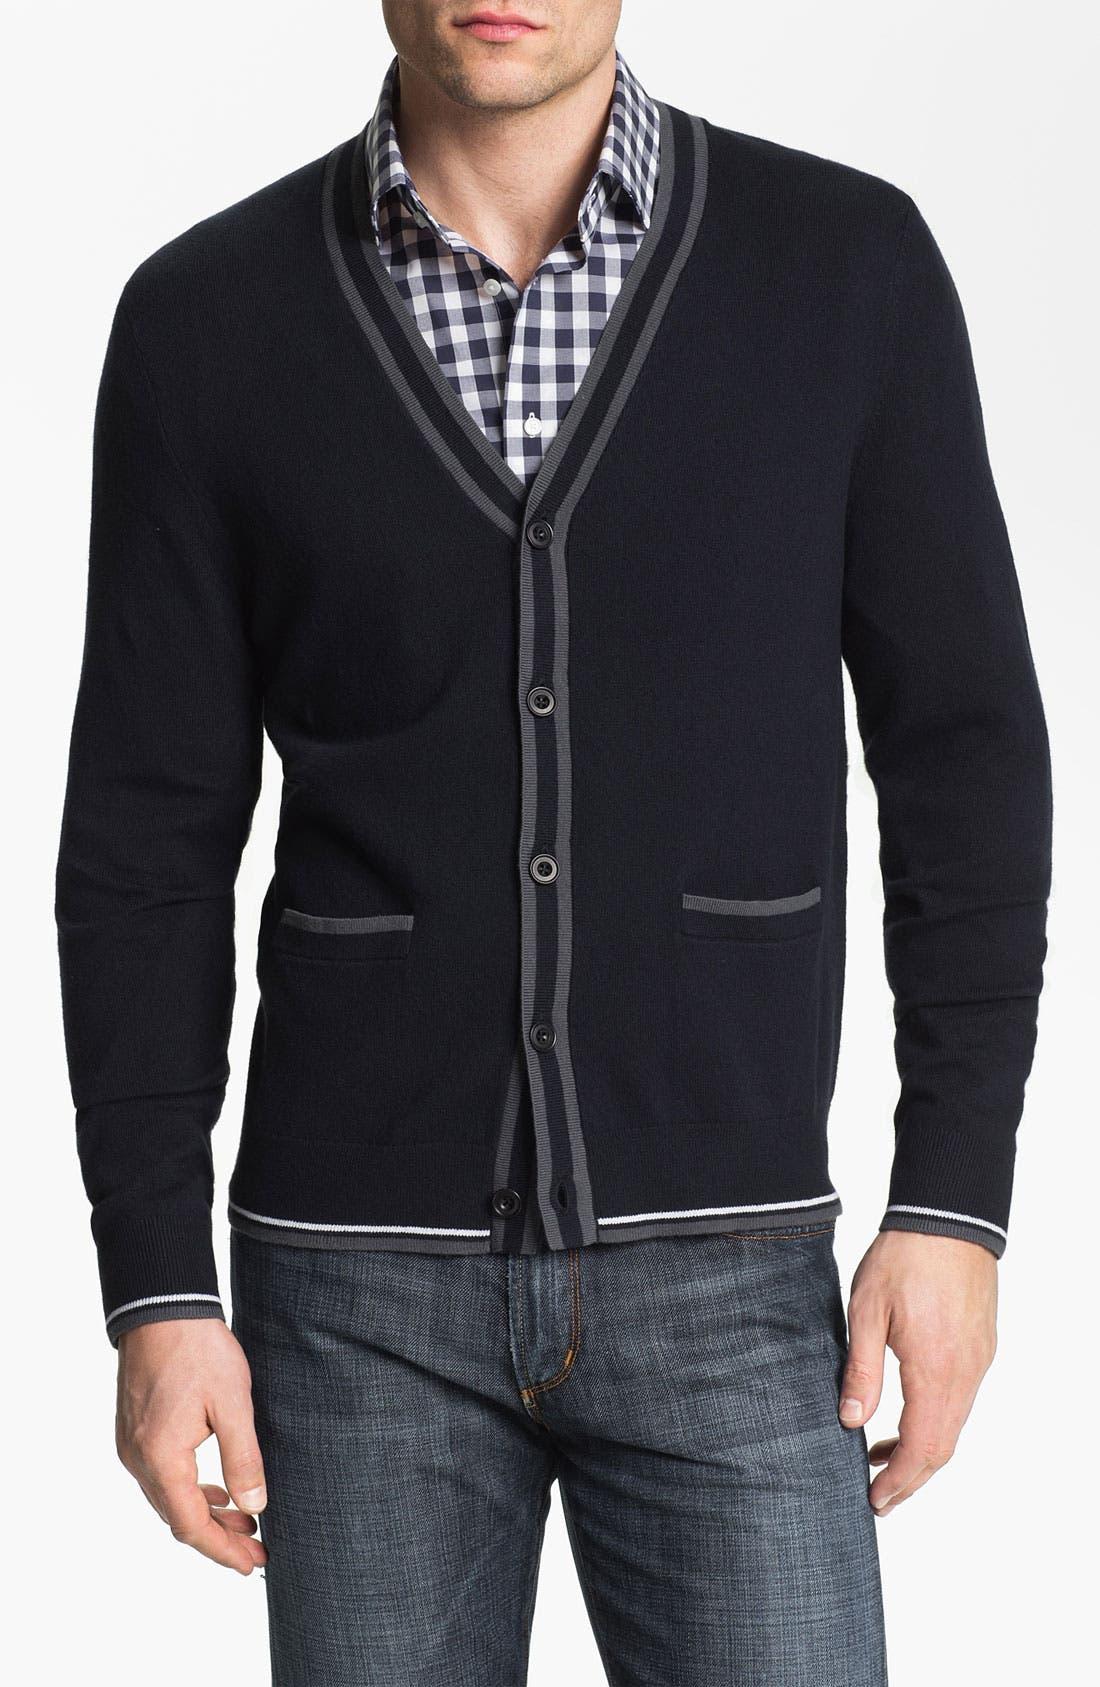 Main Image - Calibrate 'Demuth' Cashmere Blend Button Cardigan